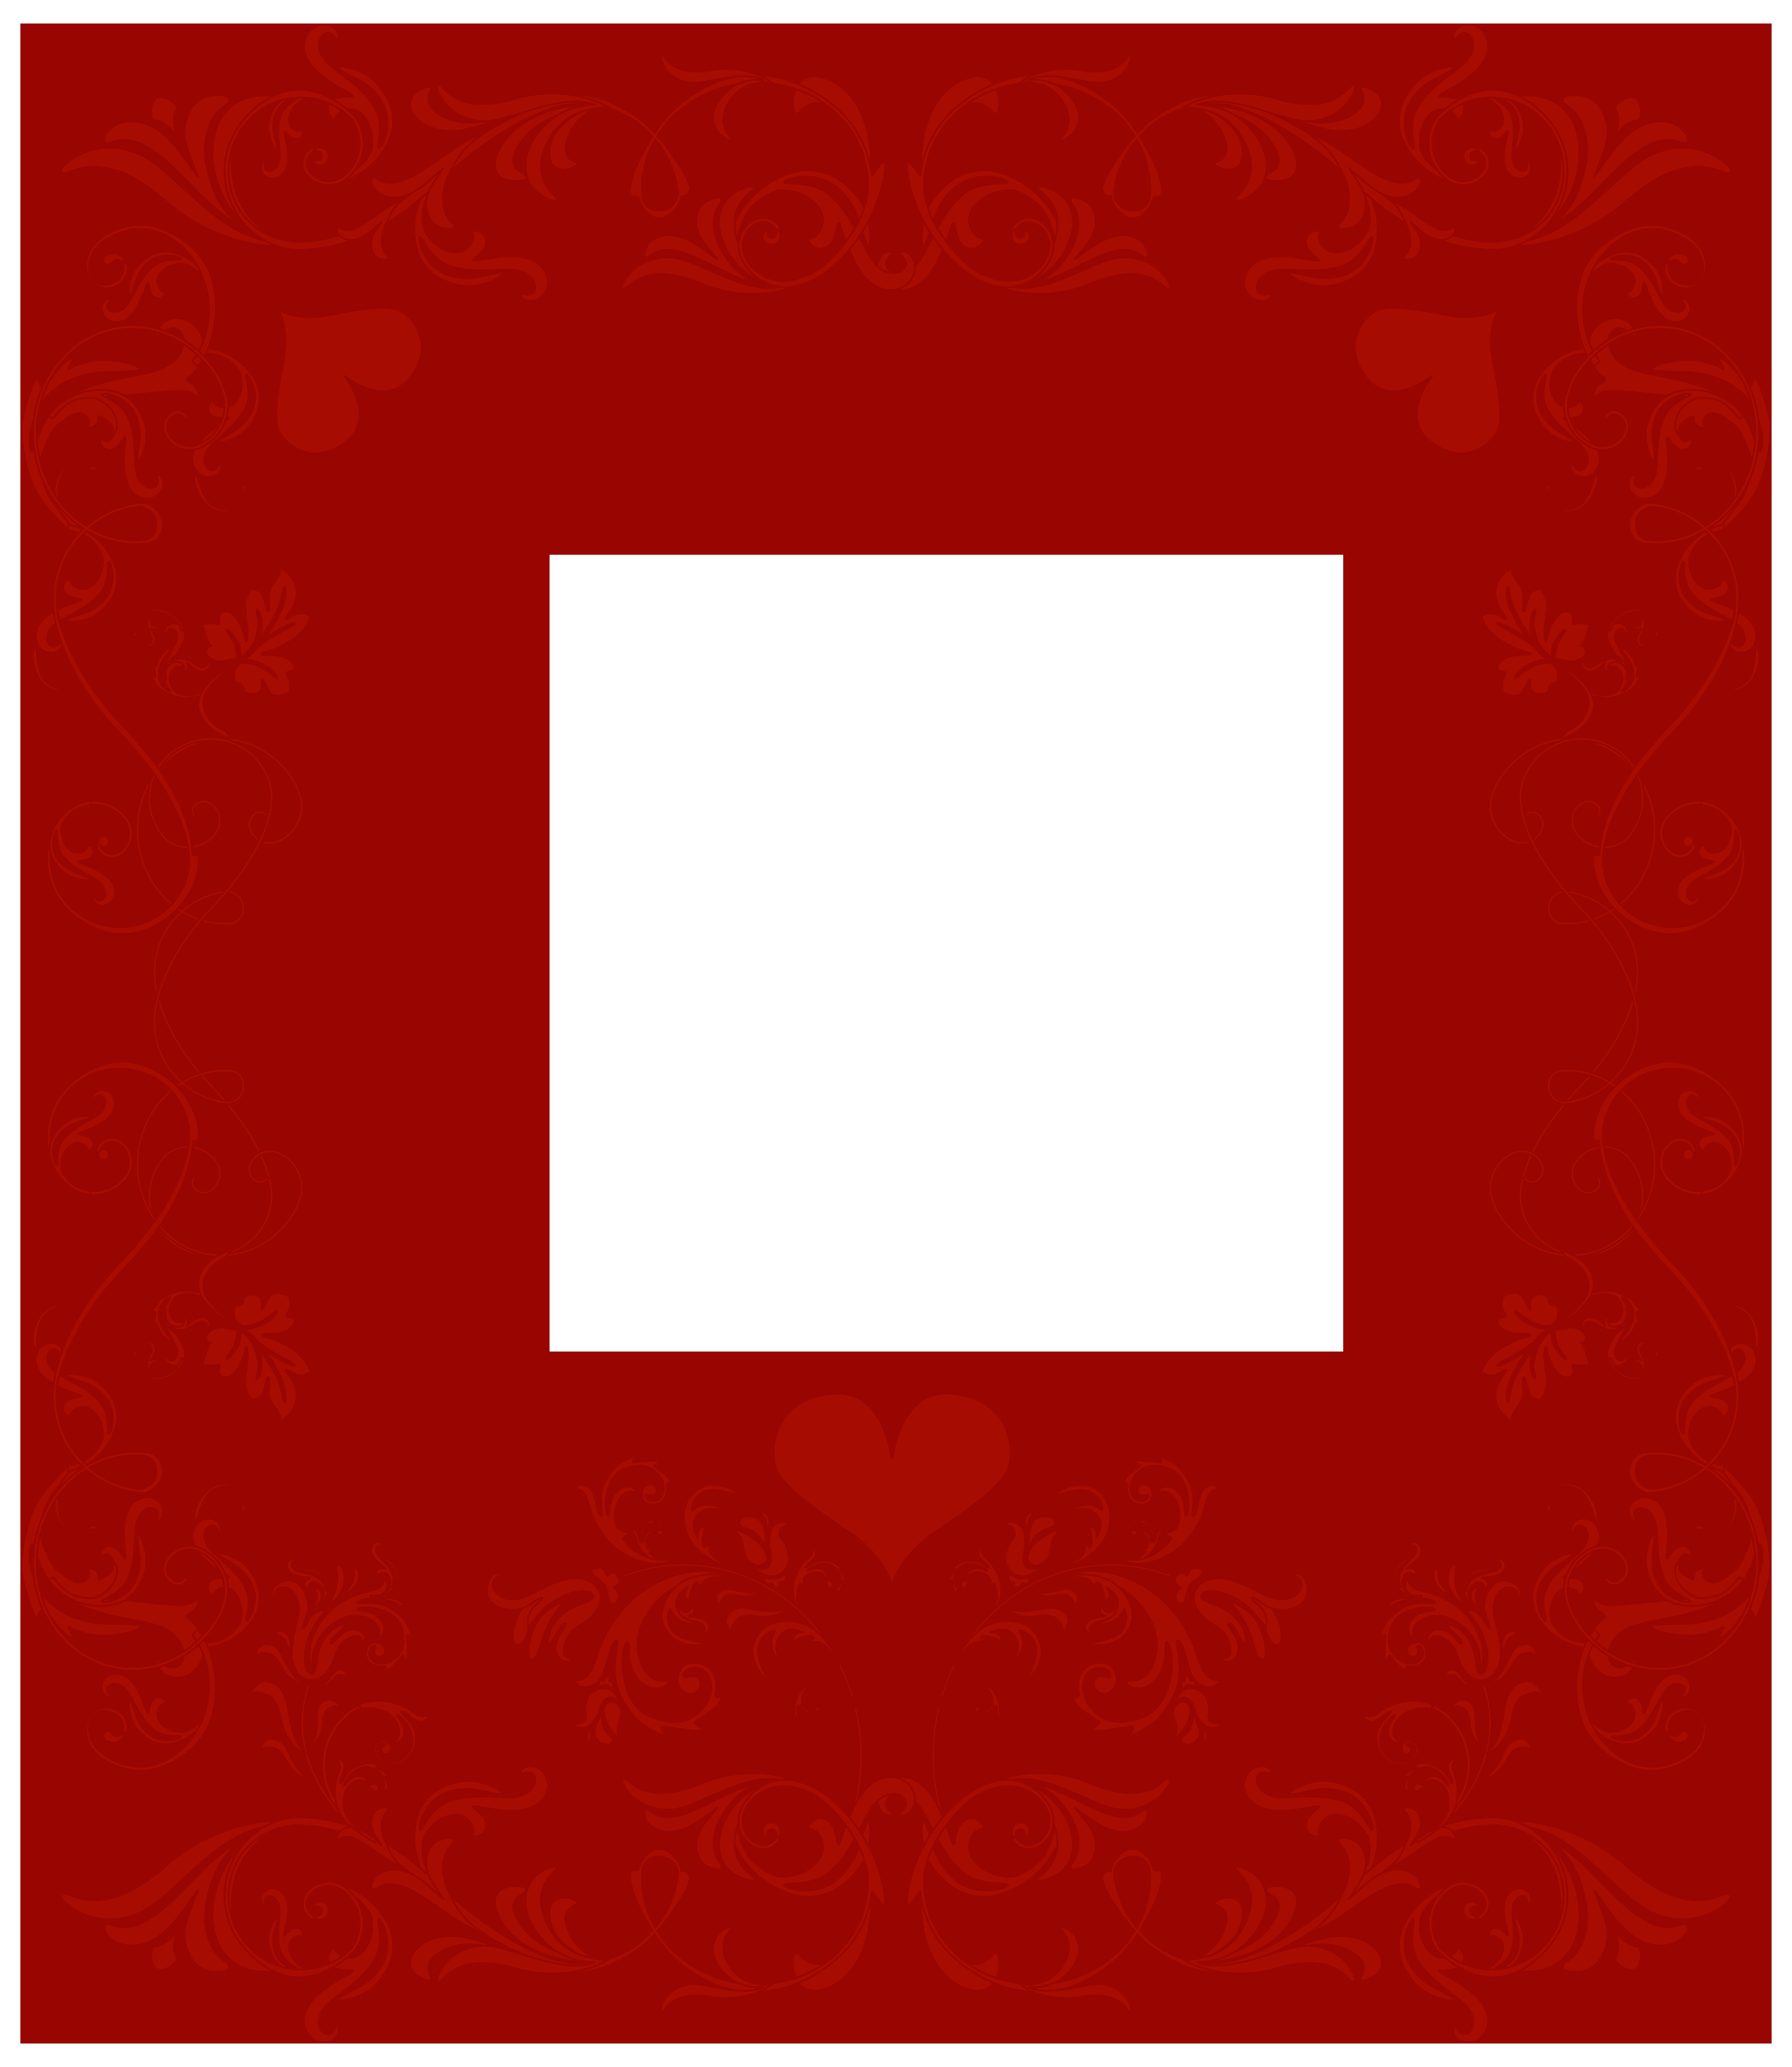 6936x8000 Valentine#39s Day Decorative Border Transparent PNG Clip Art Image